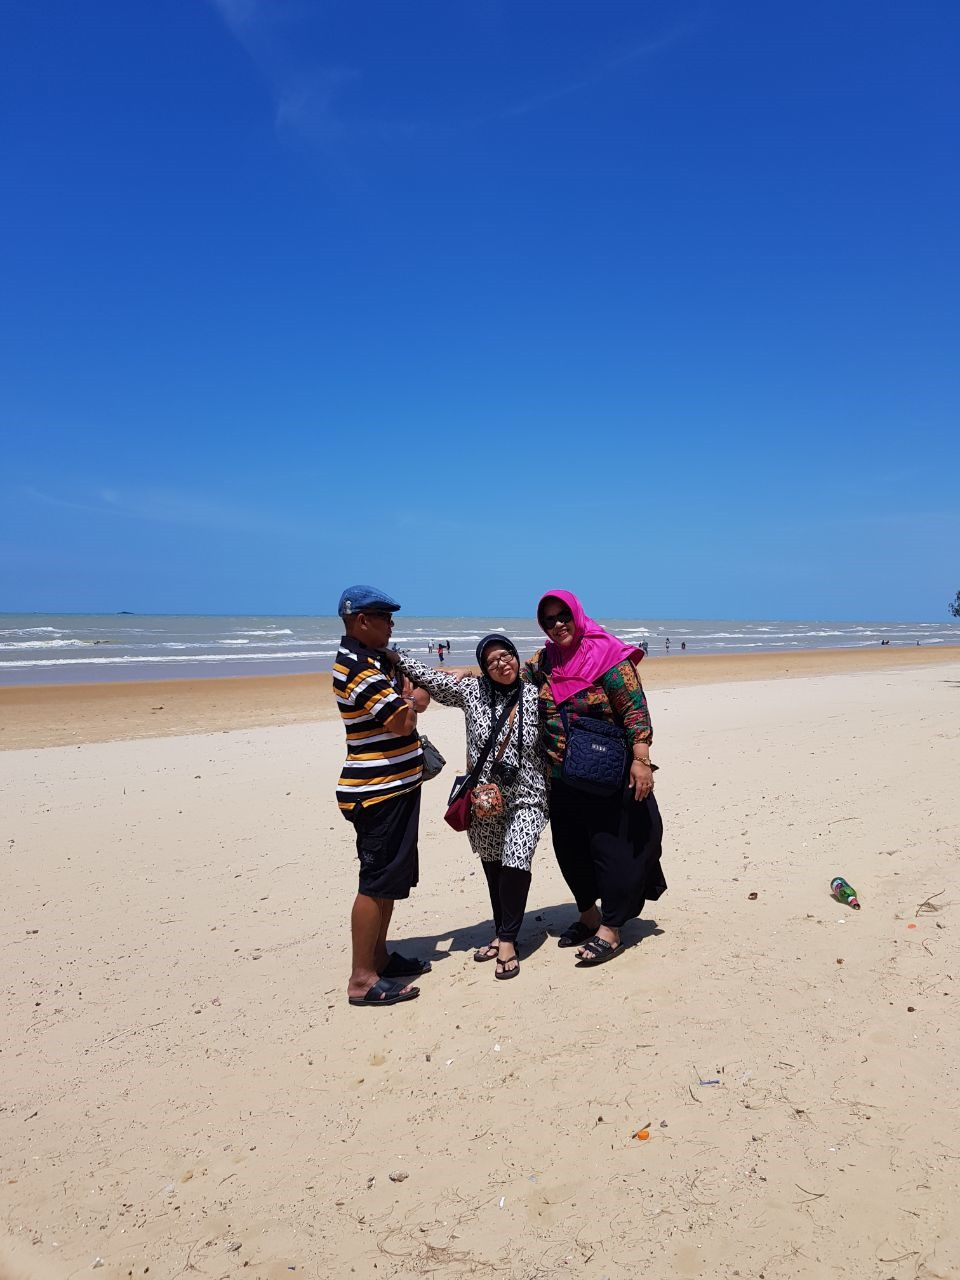 cerita teman perjalanan, three people, in the beach